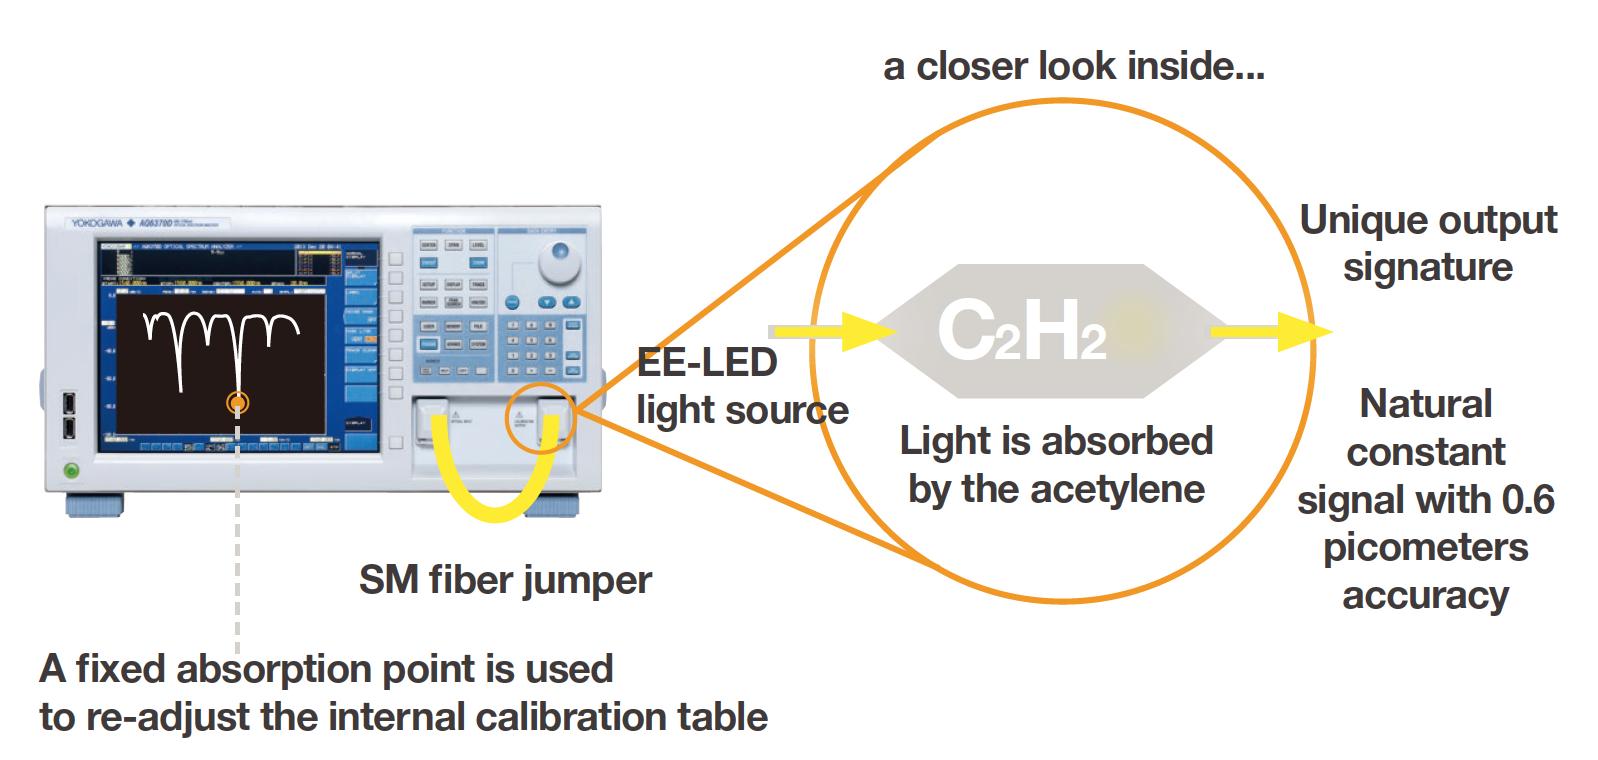 Aq6374 Wide Range Optical Spectrum Analyzer 350 1750 Nm Yokogawa Design A Laserdiode Driver For Finder Applications Ee Times Calibration